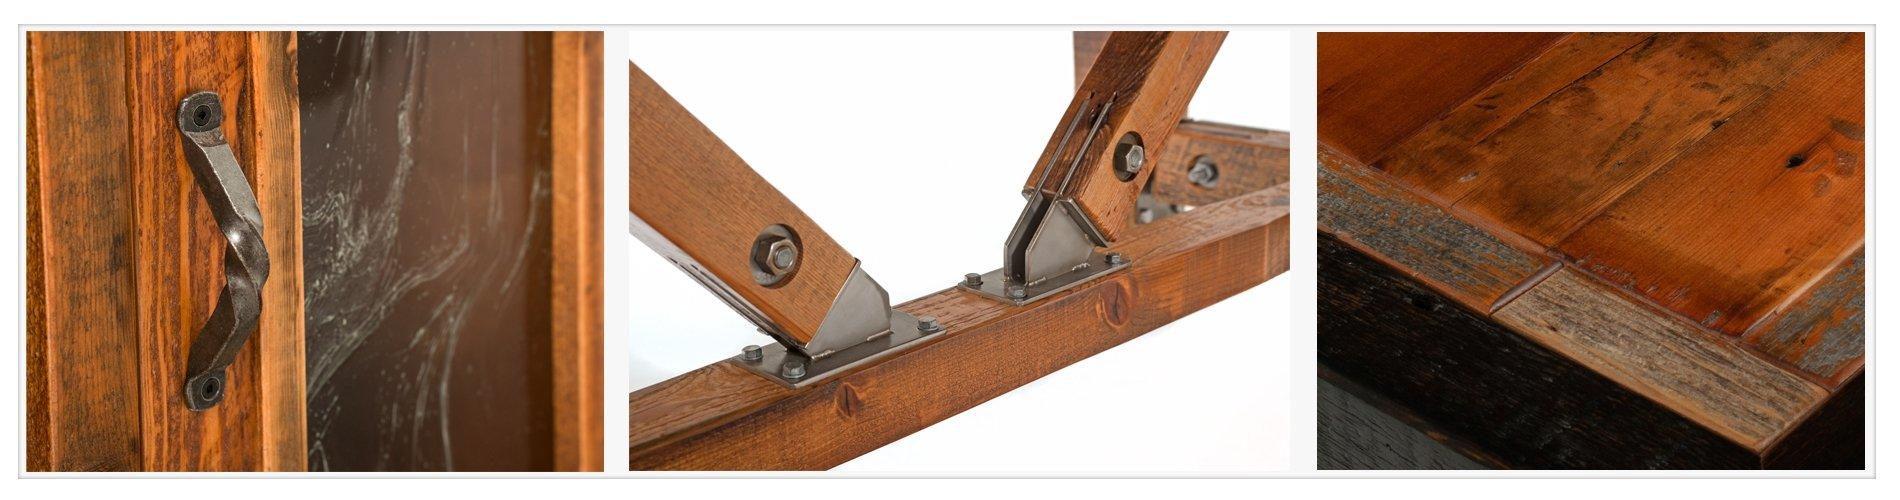 Barnwood Manufacturing Images